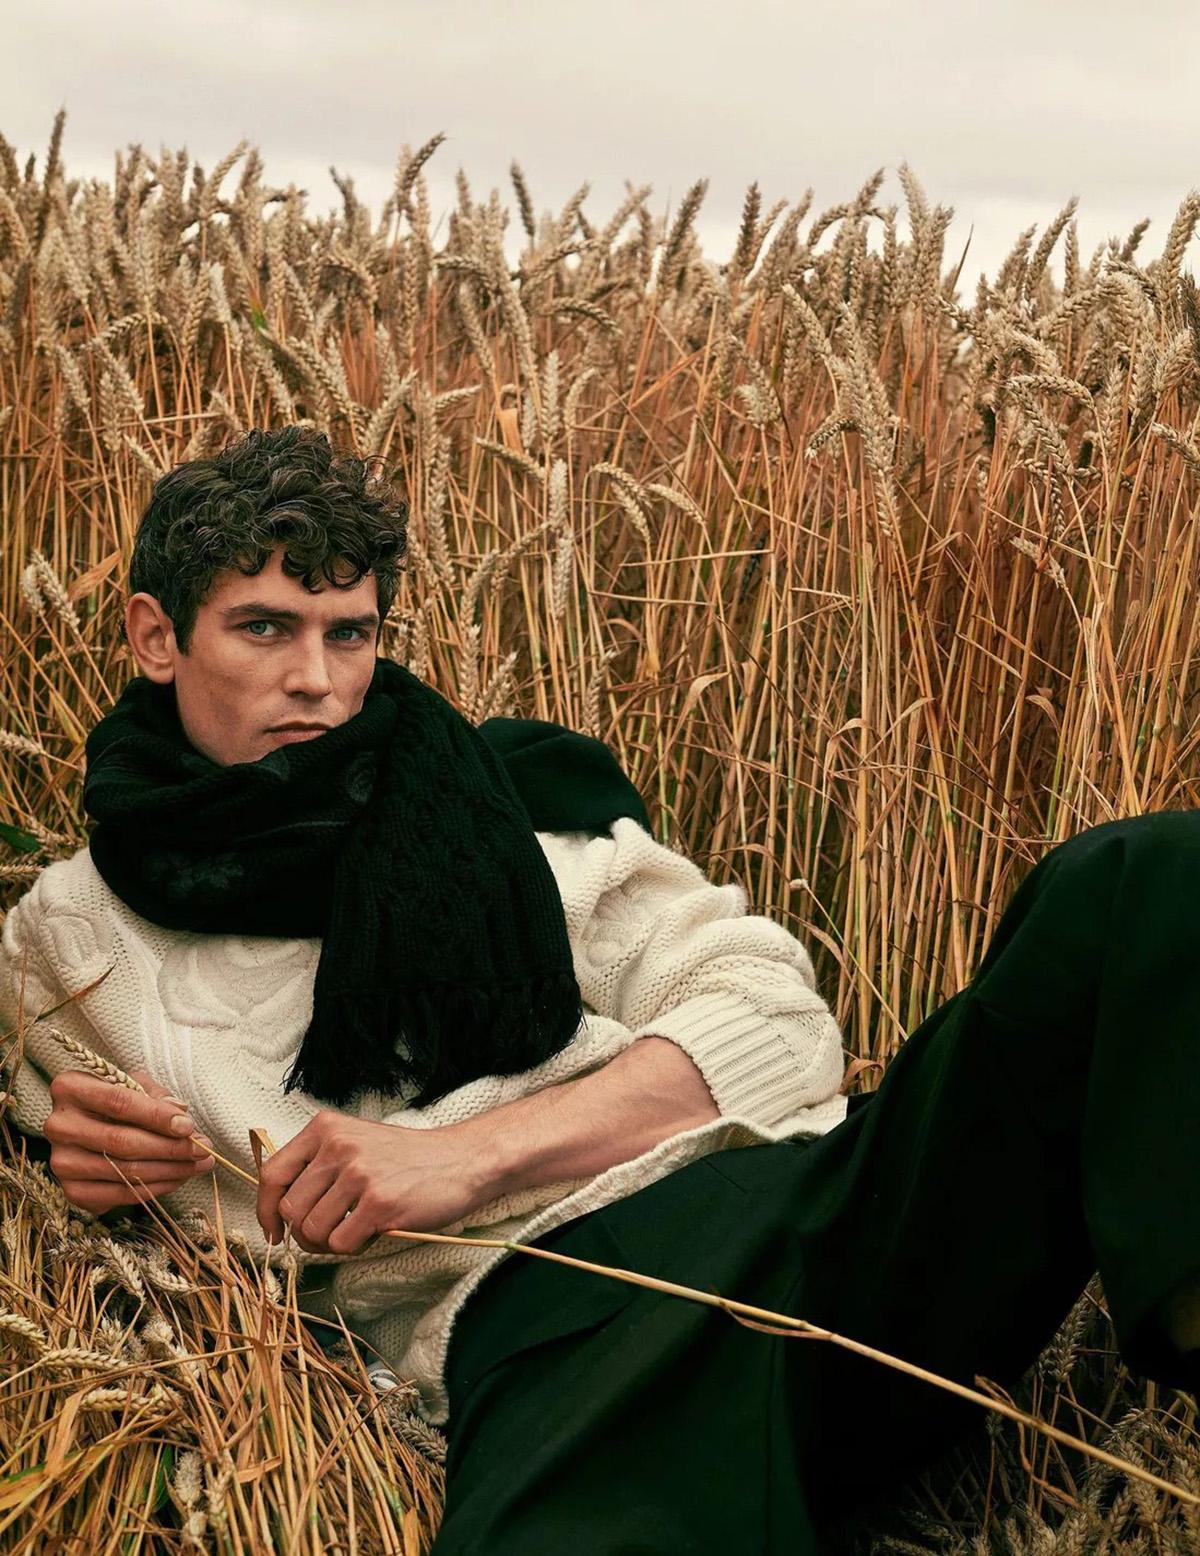 Arthur Gosse and Jester White by Zeb Daemen for Madame Figaro September 17th, 2021